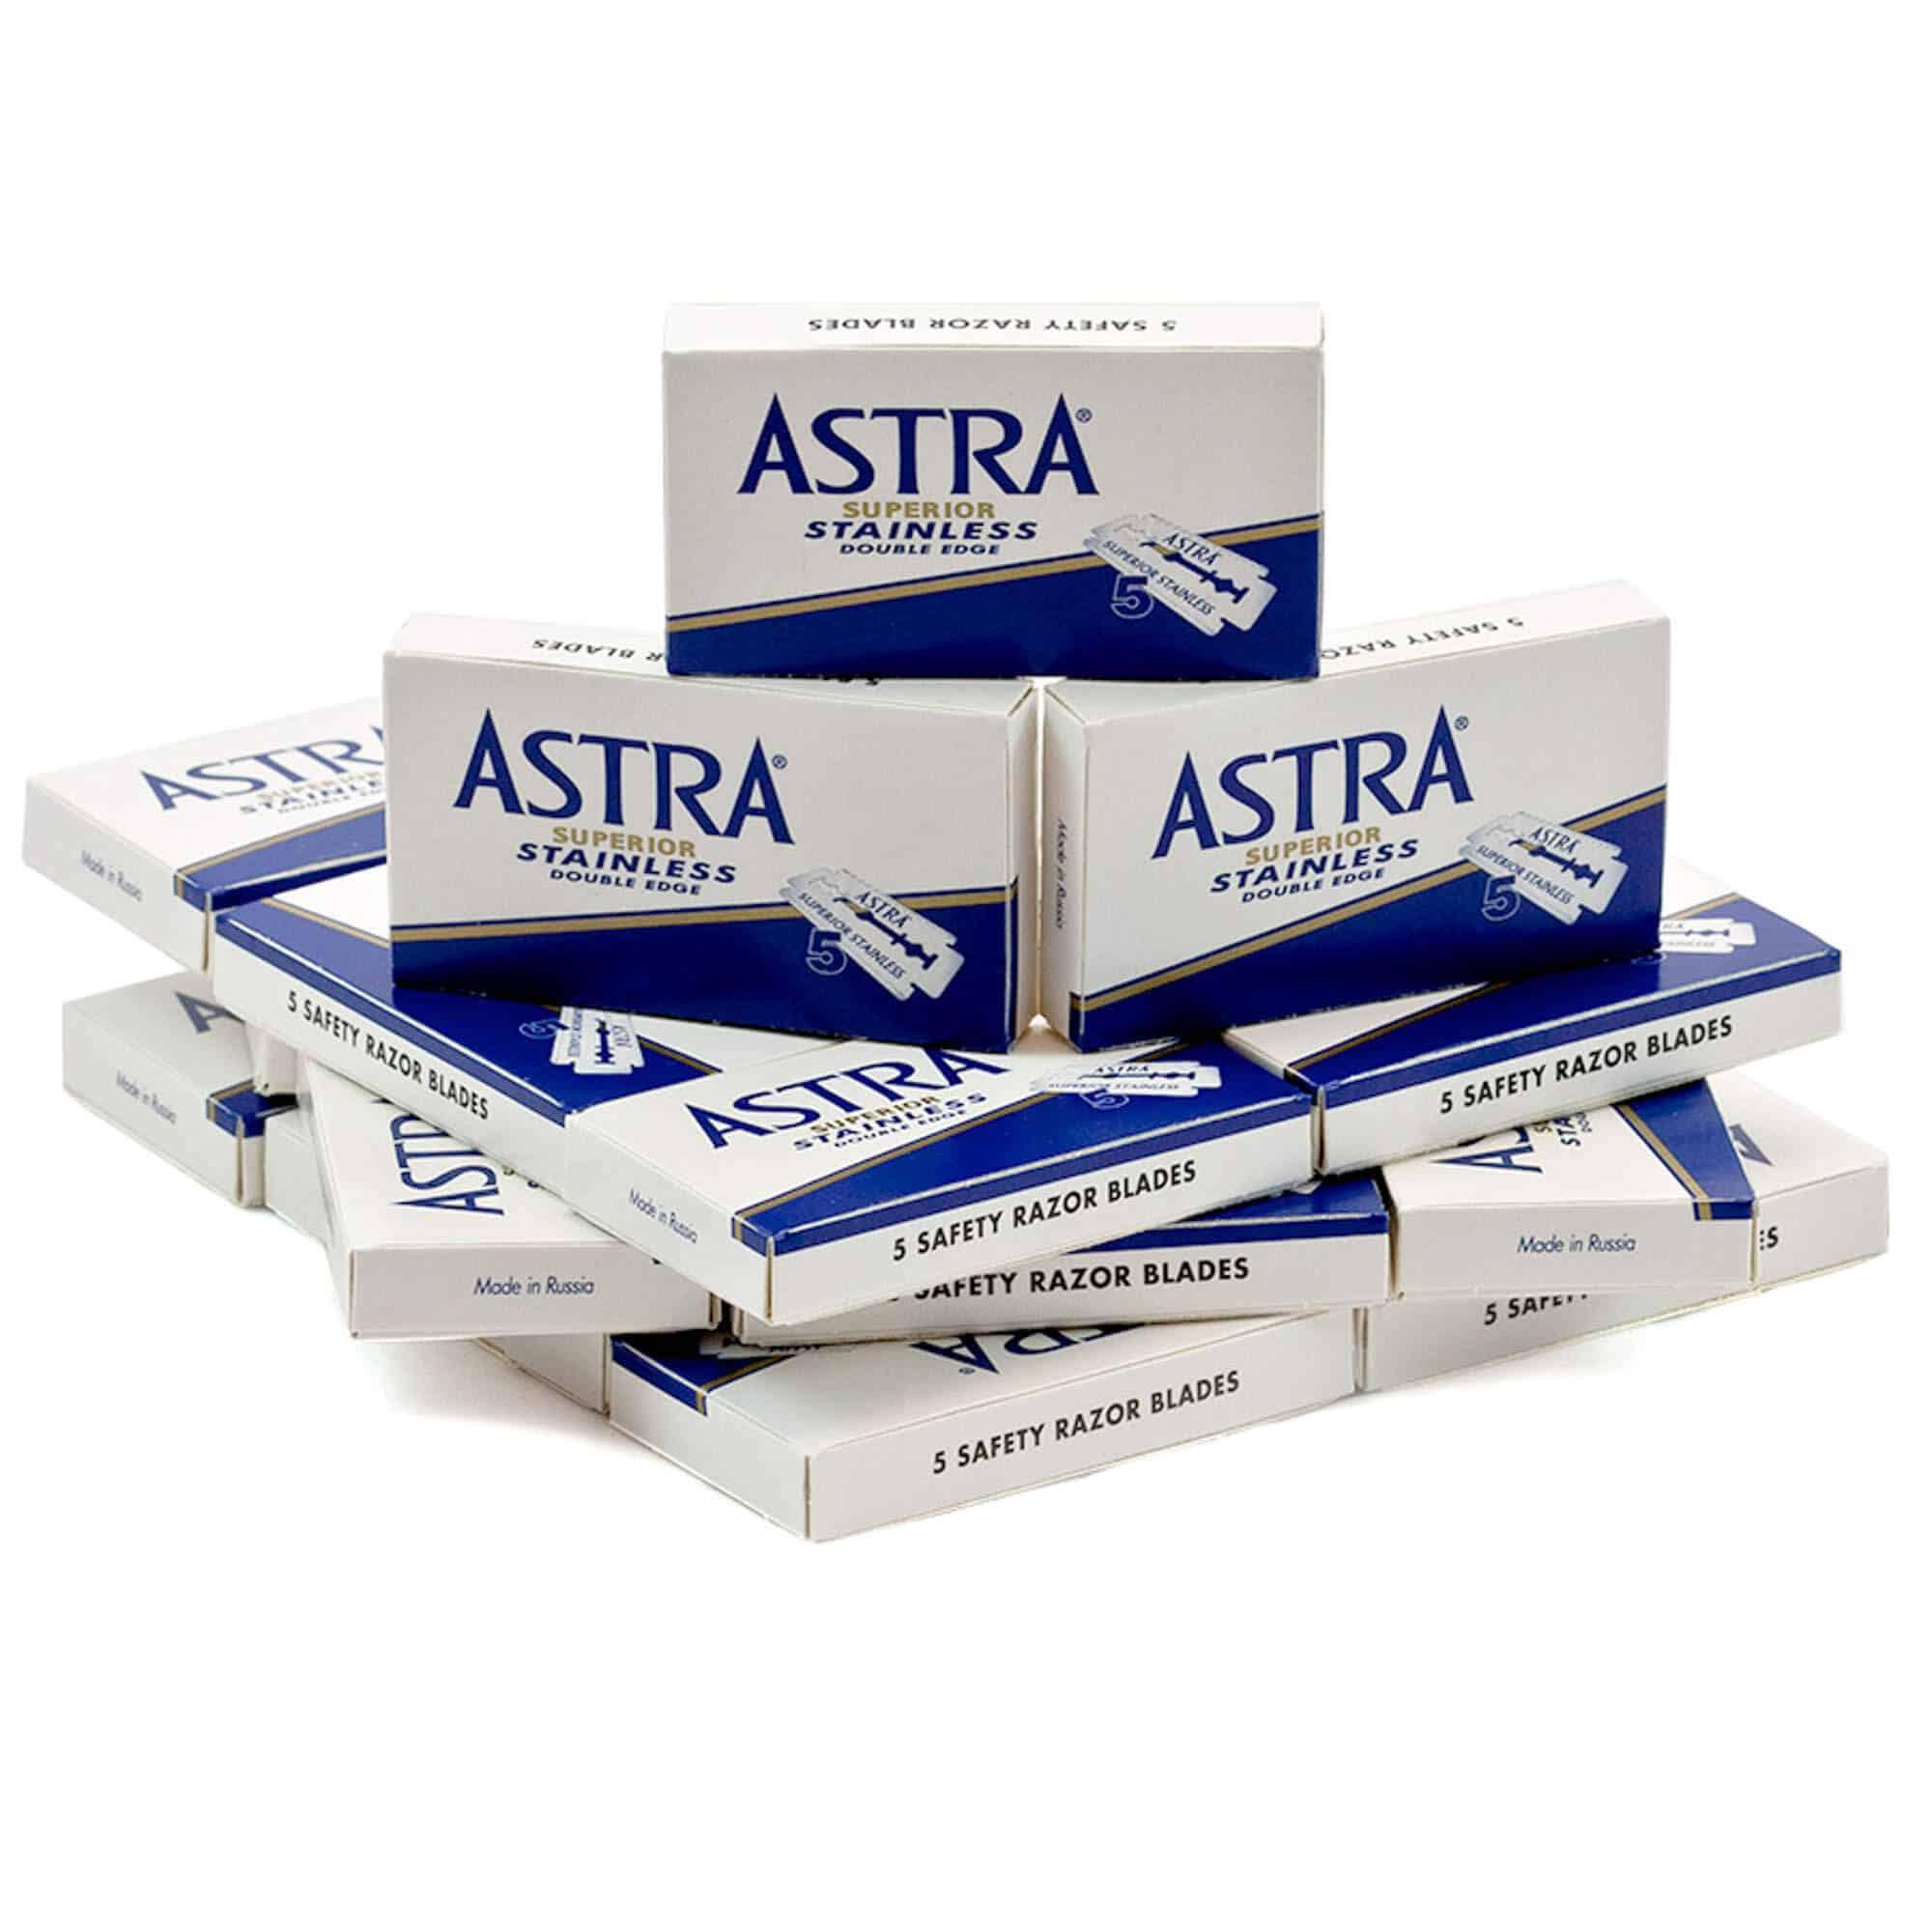 Astra blue blades